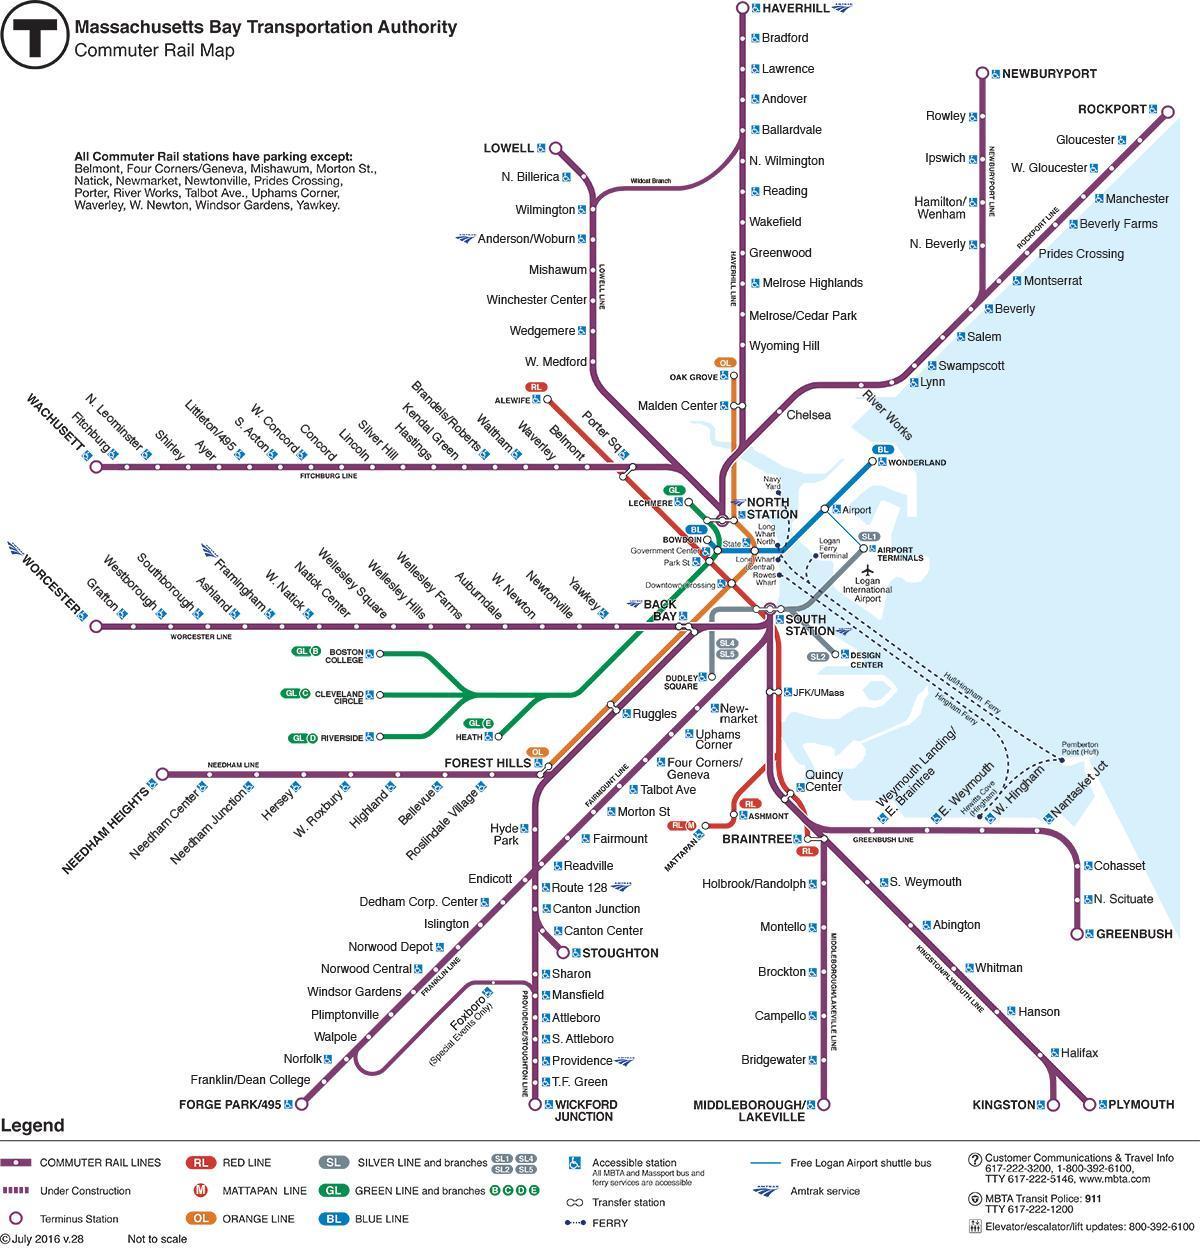 karta pendeltåg MBTA pendeltåg karta   Pendeltåg karta Boston (Usa) karta pendeltåg